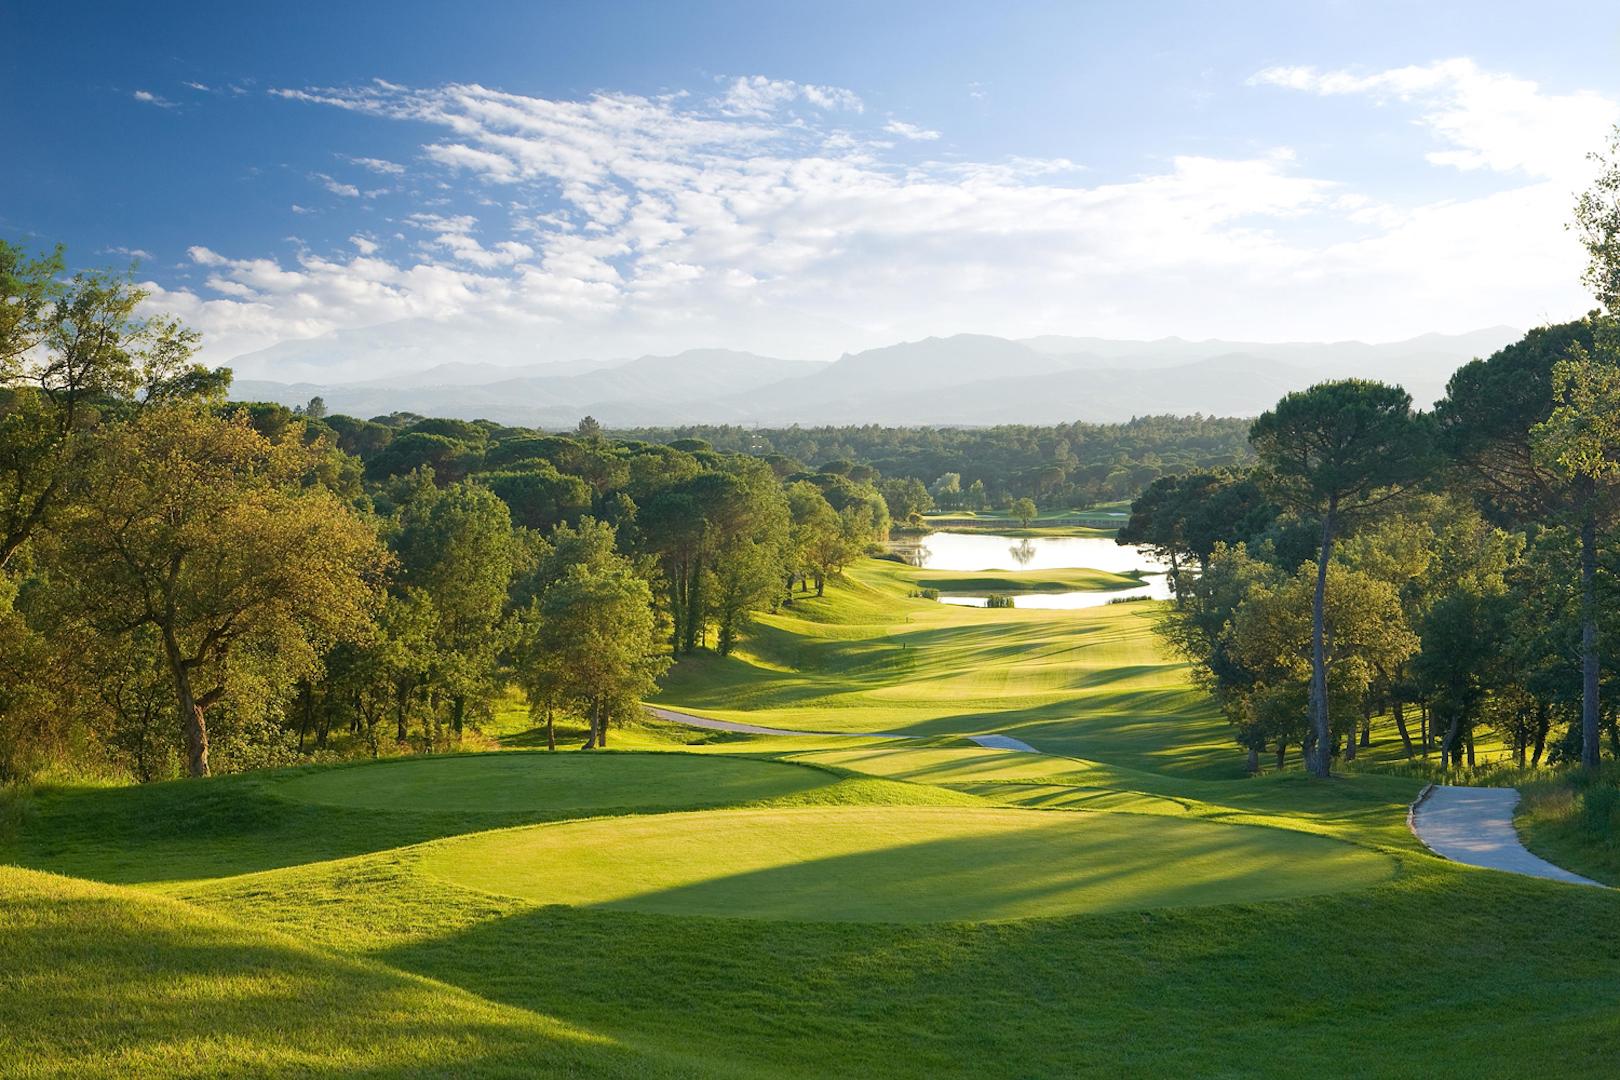 PGA Catalunya confirms status as No 1 course in Spain